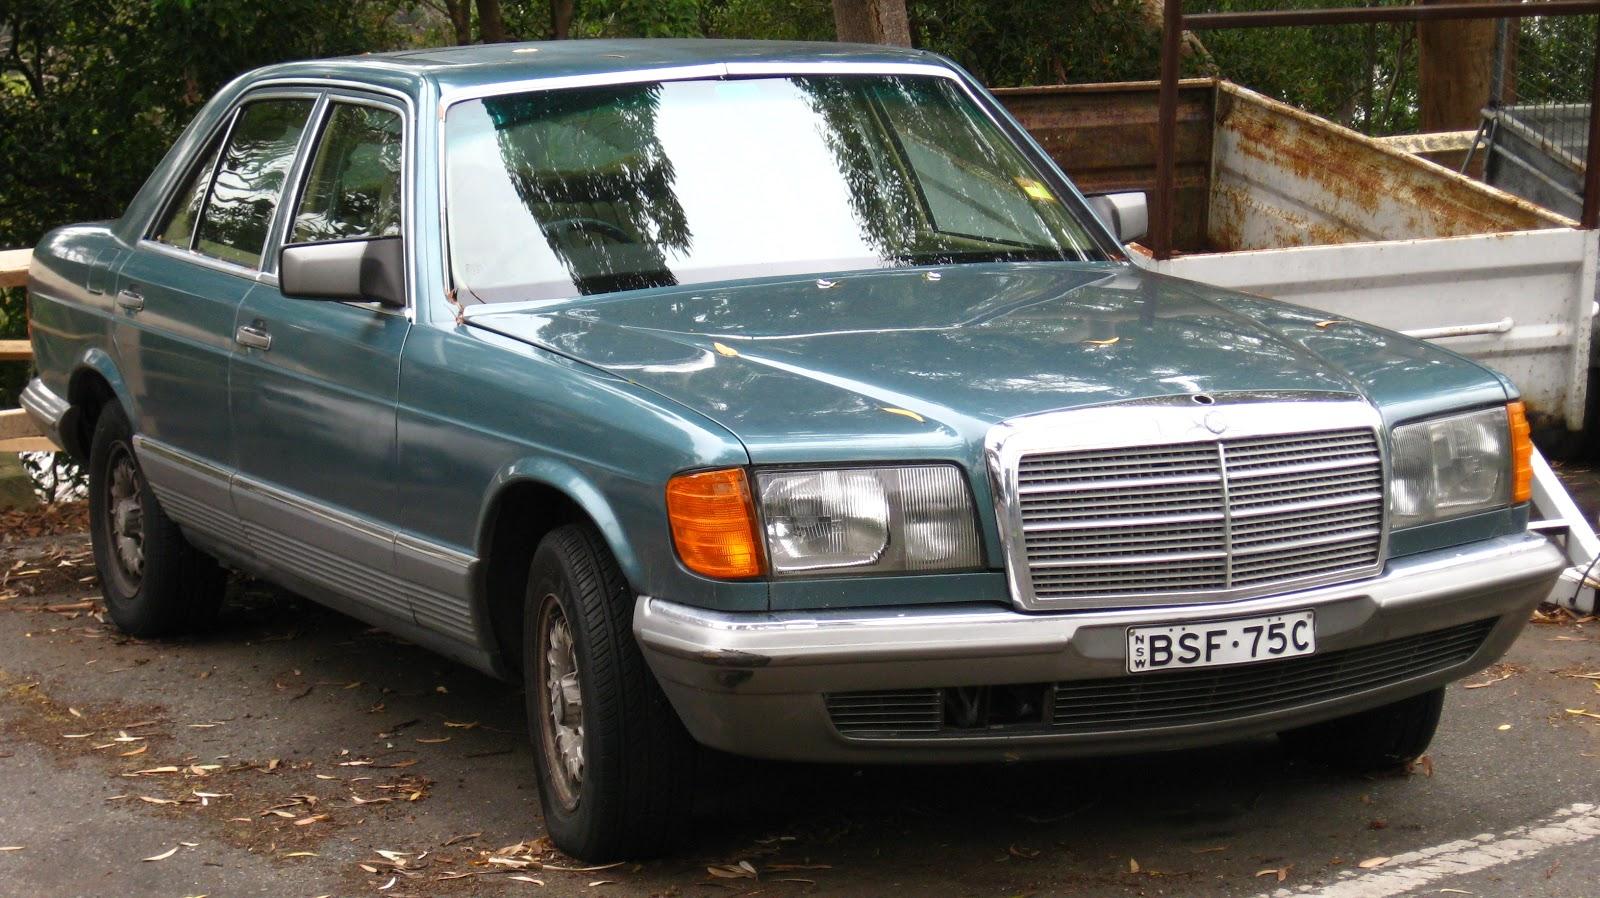 aussie old parked cars 1981 mercedes benz w126 280 se. Black Bedroom Furniture Sets. Home Design Ideas